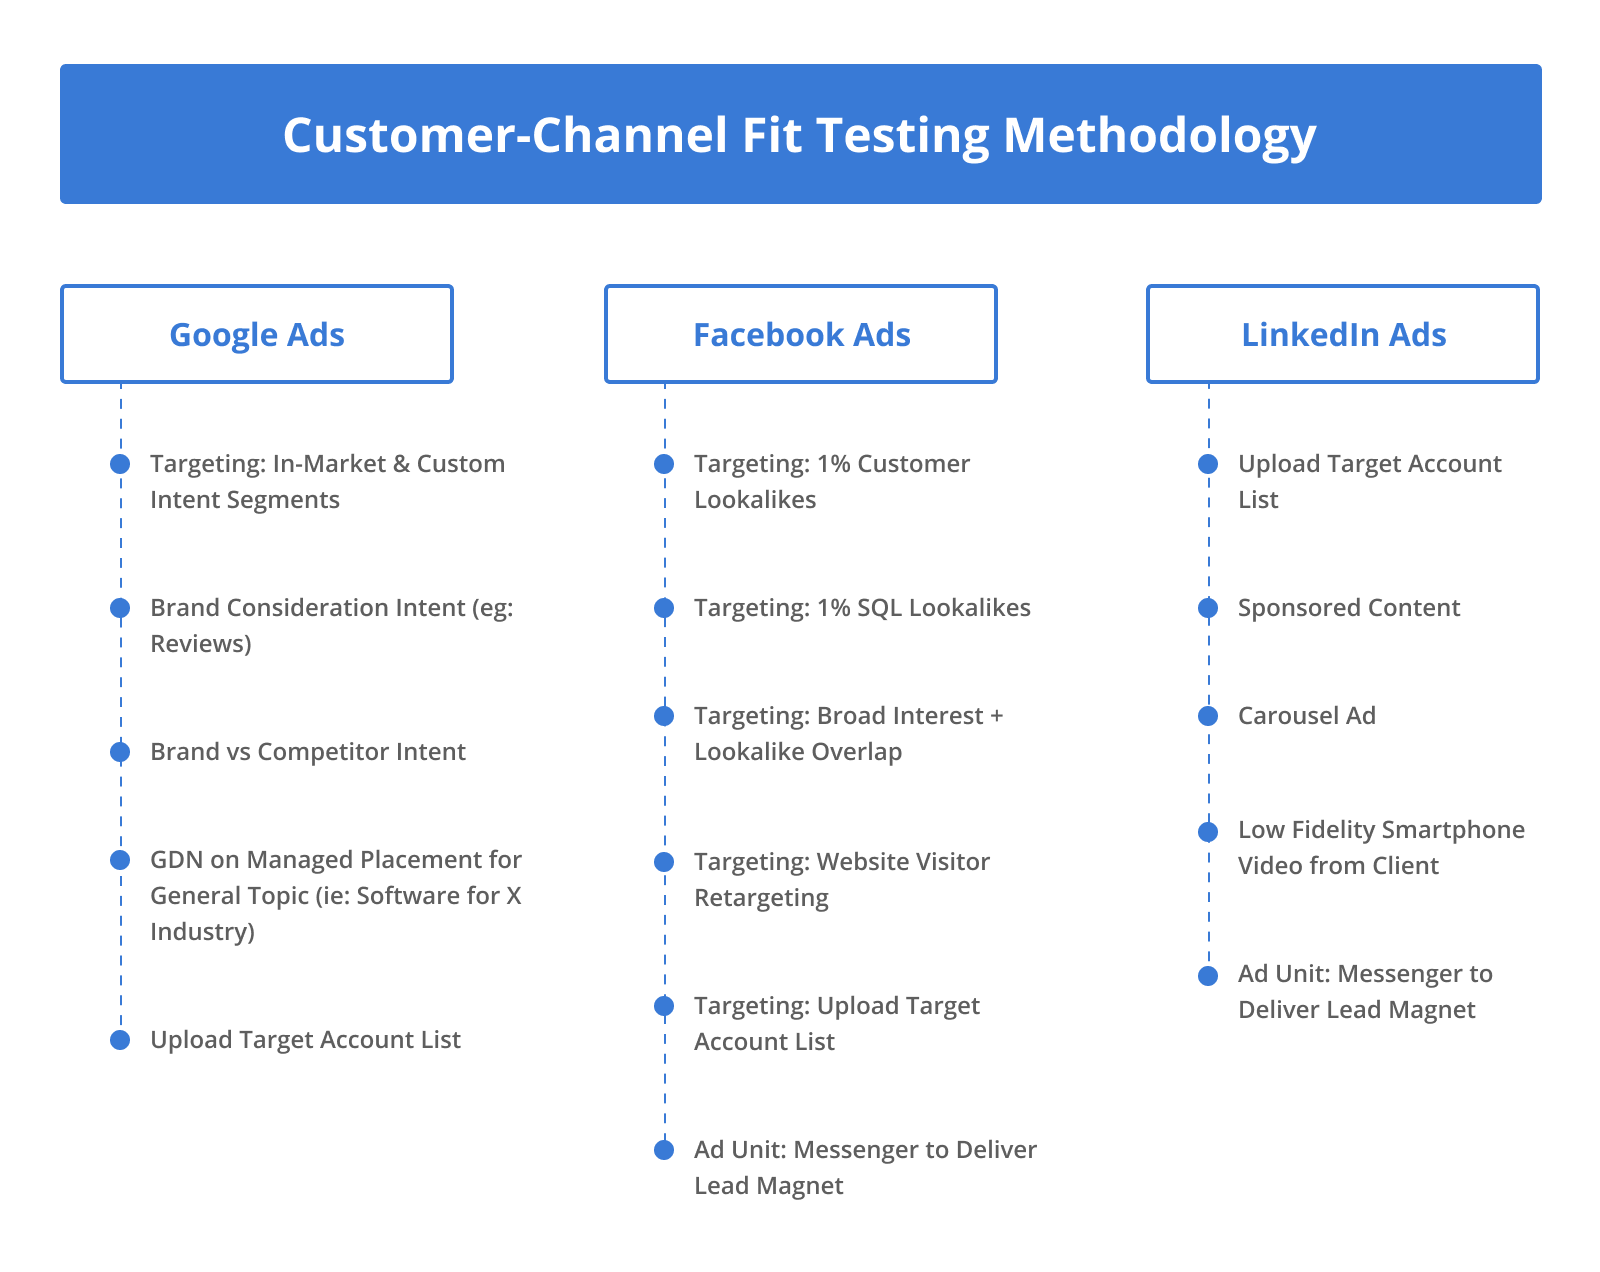 Customer-Channel Fit Testing Methodology for Google Ads, Facebook Ads, and LinkedIn Ads.